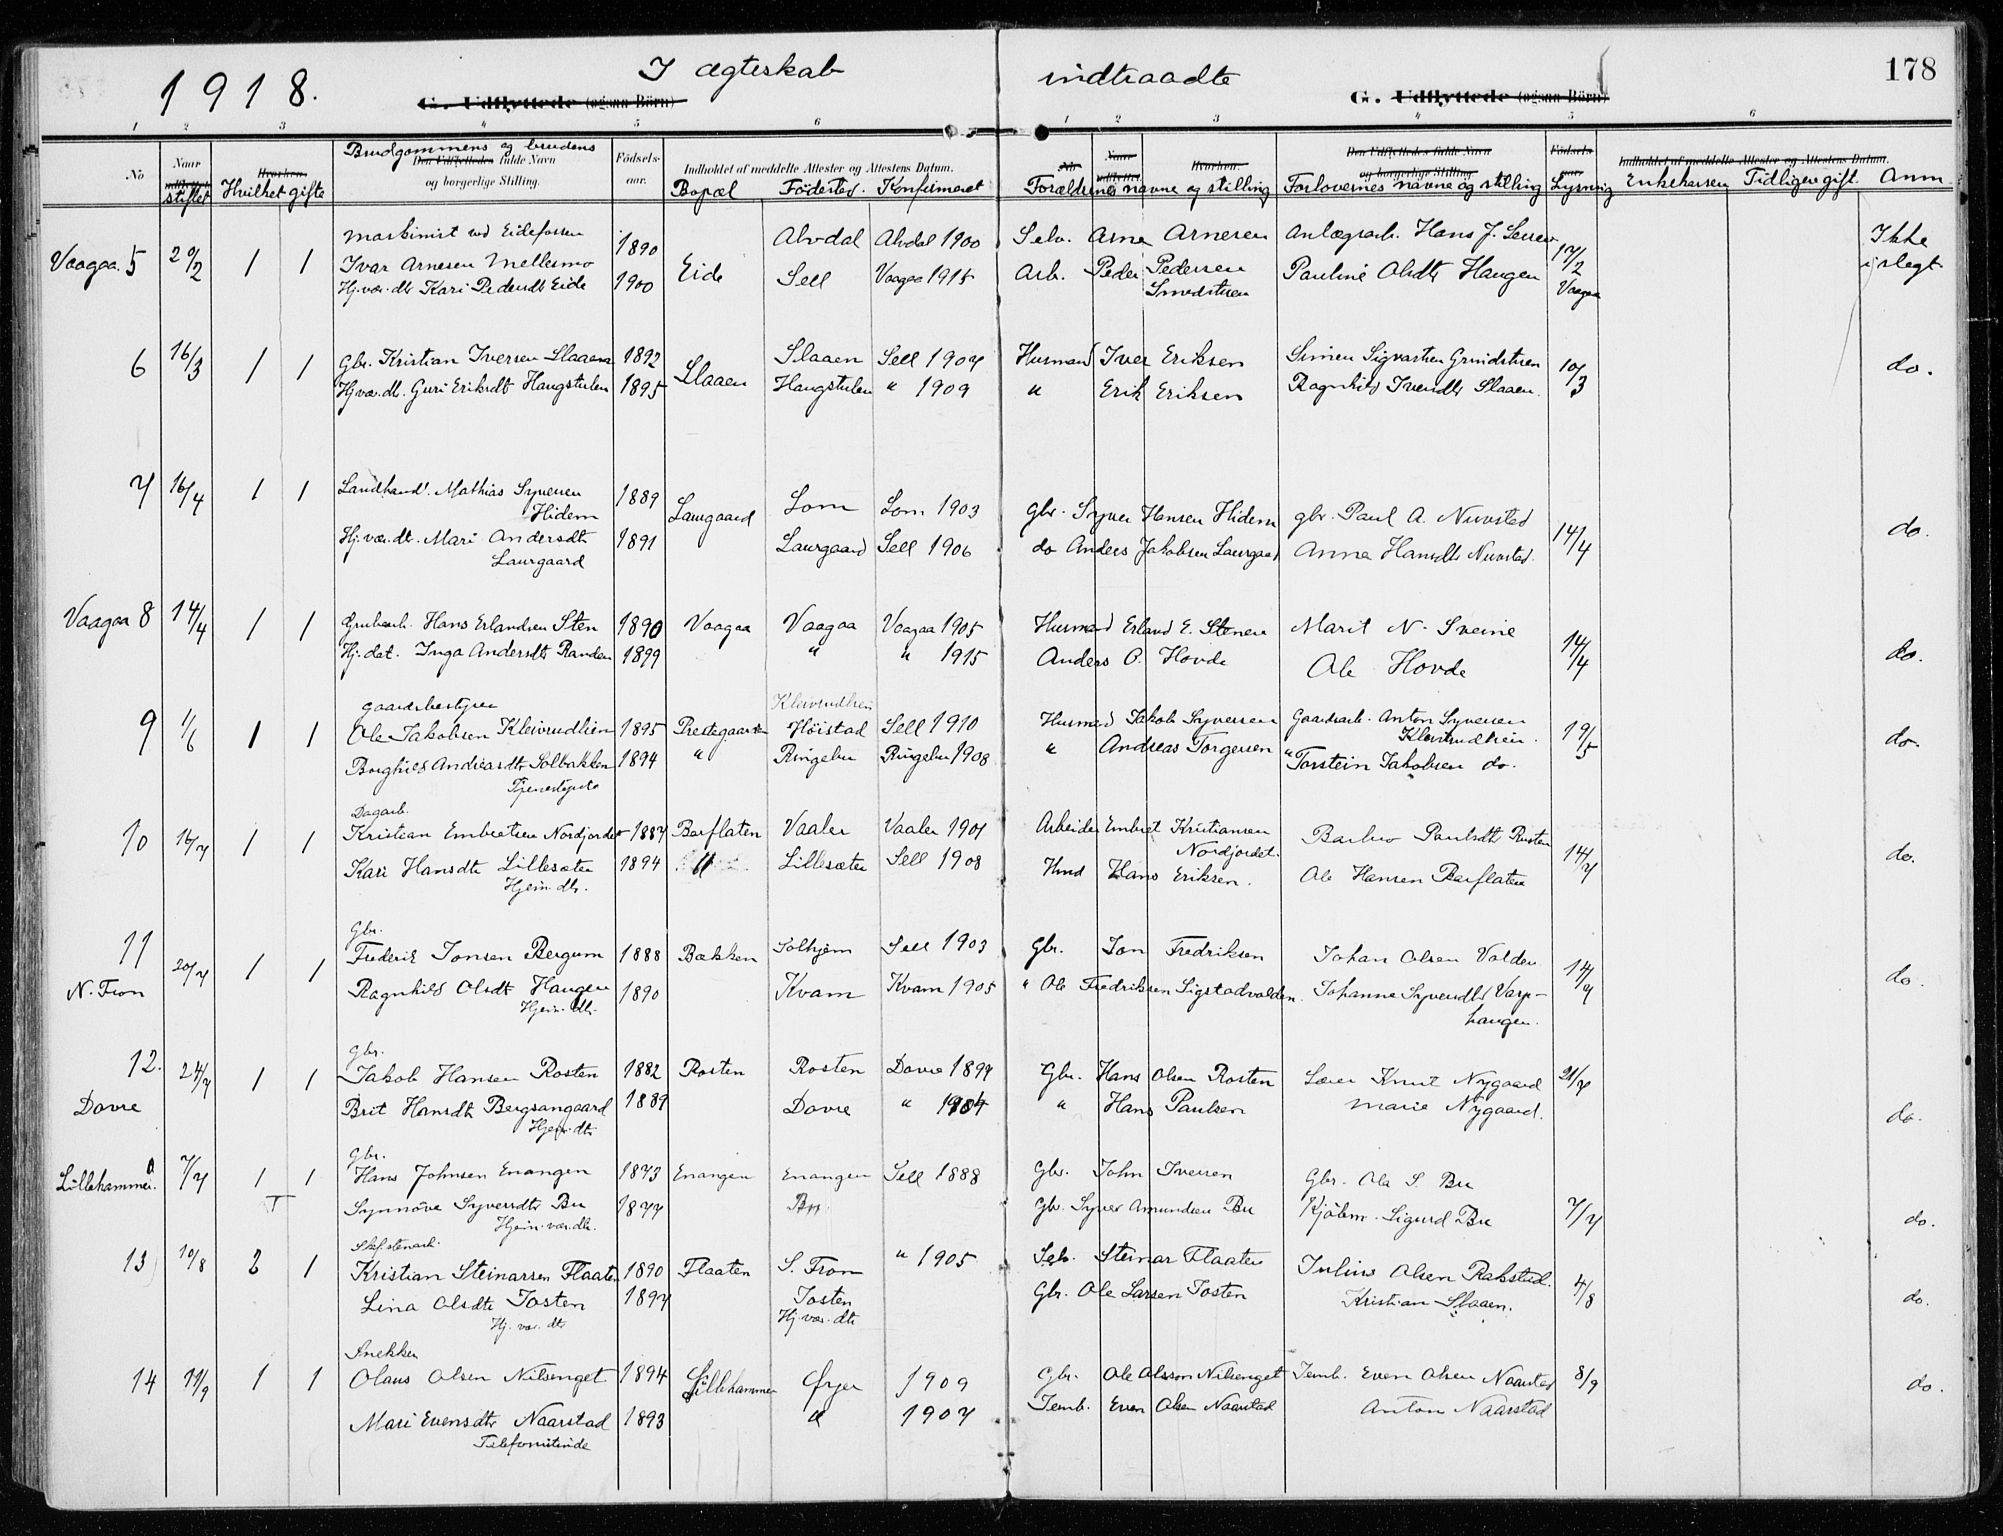 SAH, Sel prestekontor, Ministerialbok nr. 2, 1905-1919, s. 178